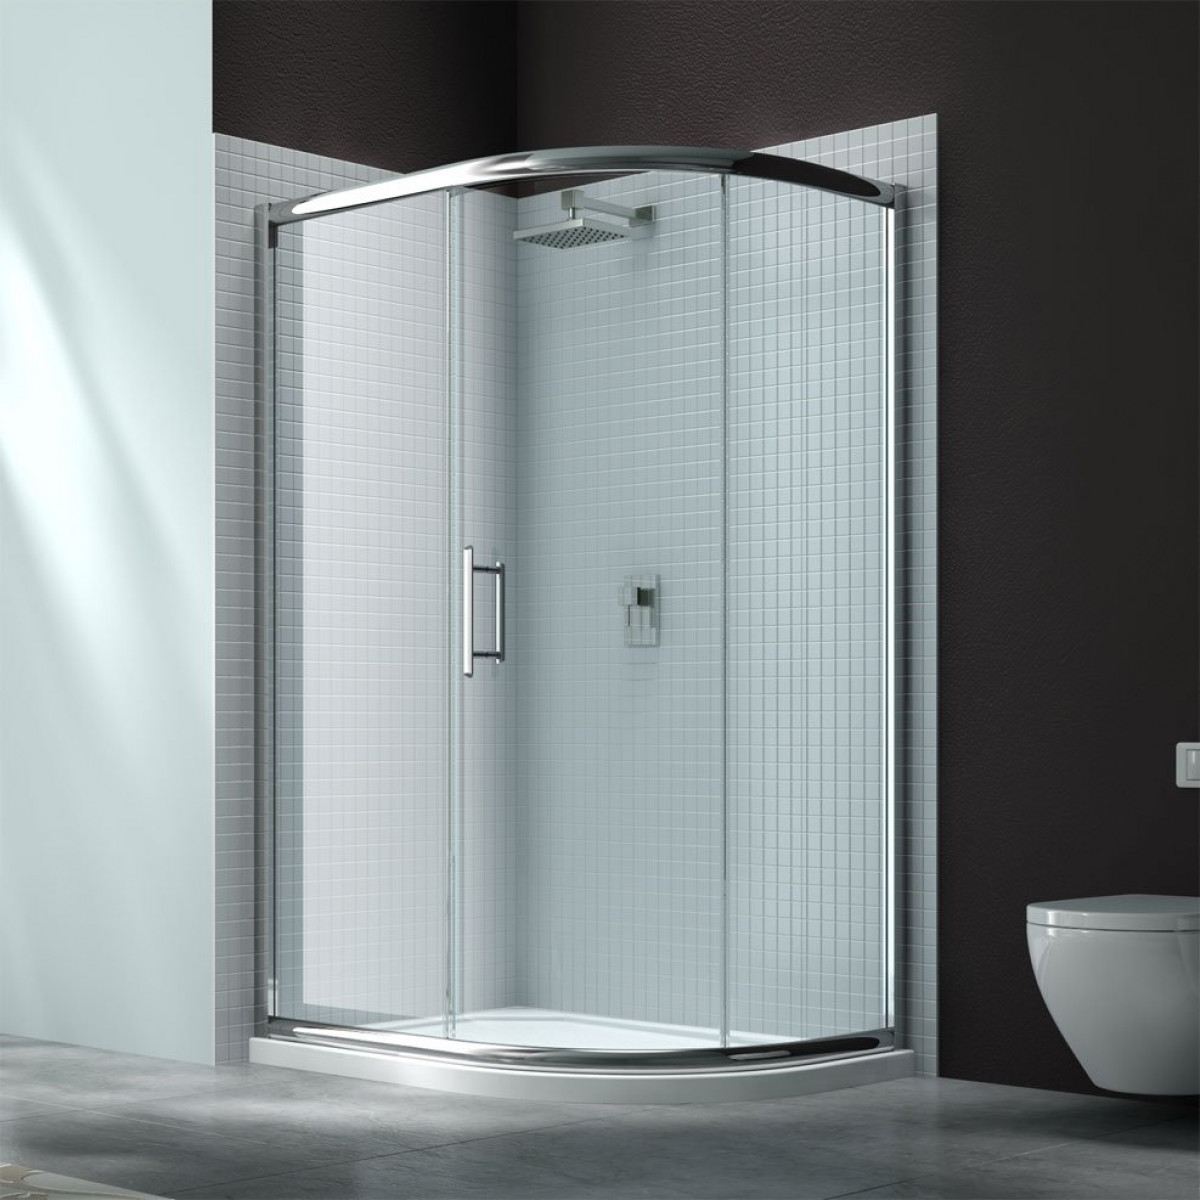 Merlyn 6 Series 1000 X 800 1 Door Offset Quadrant Shower